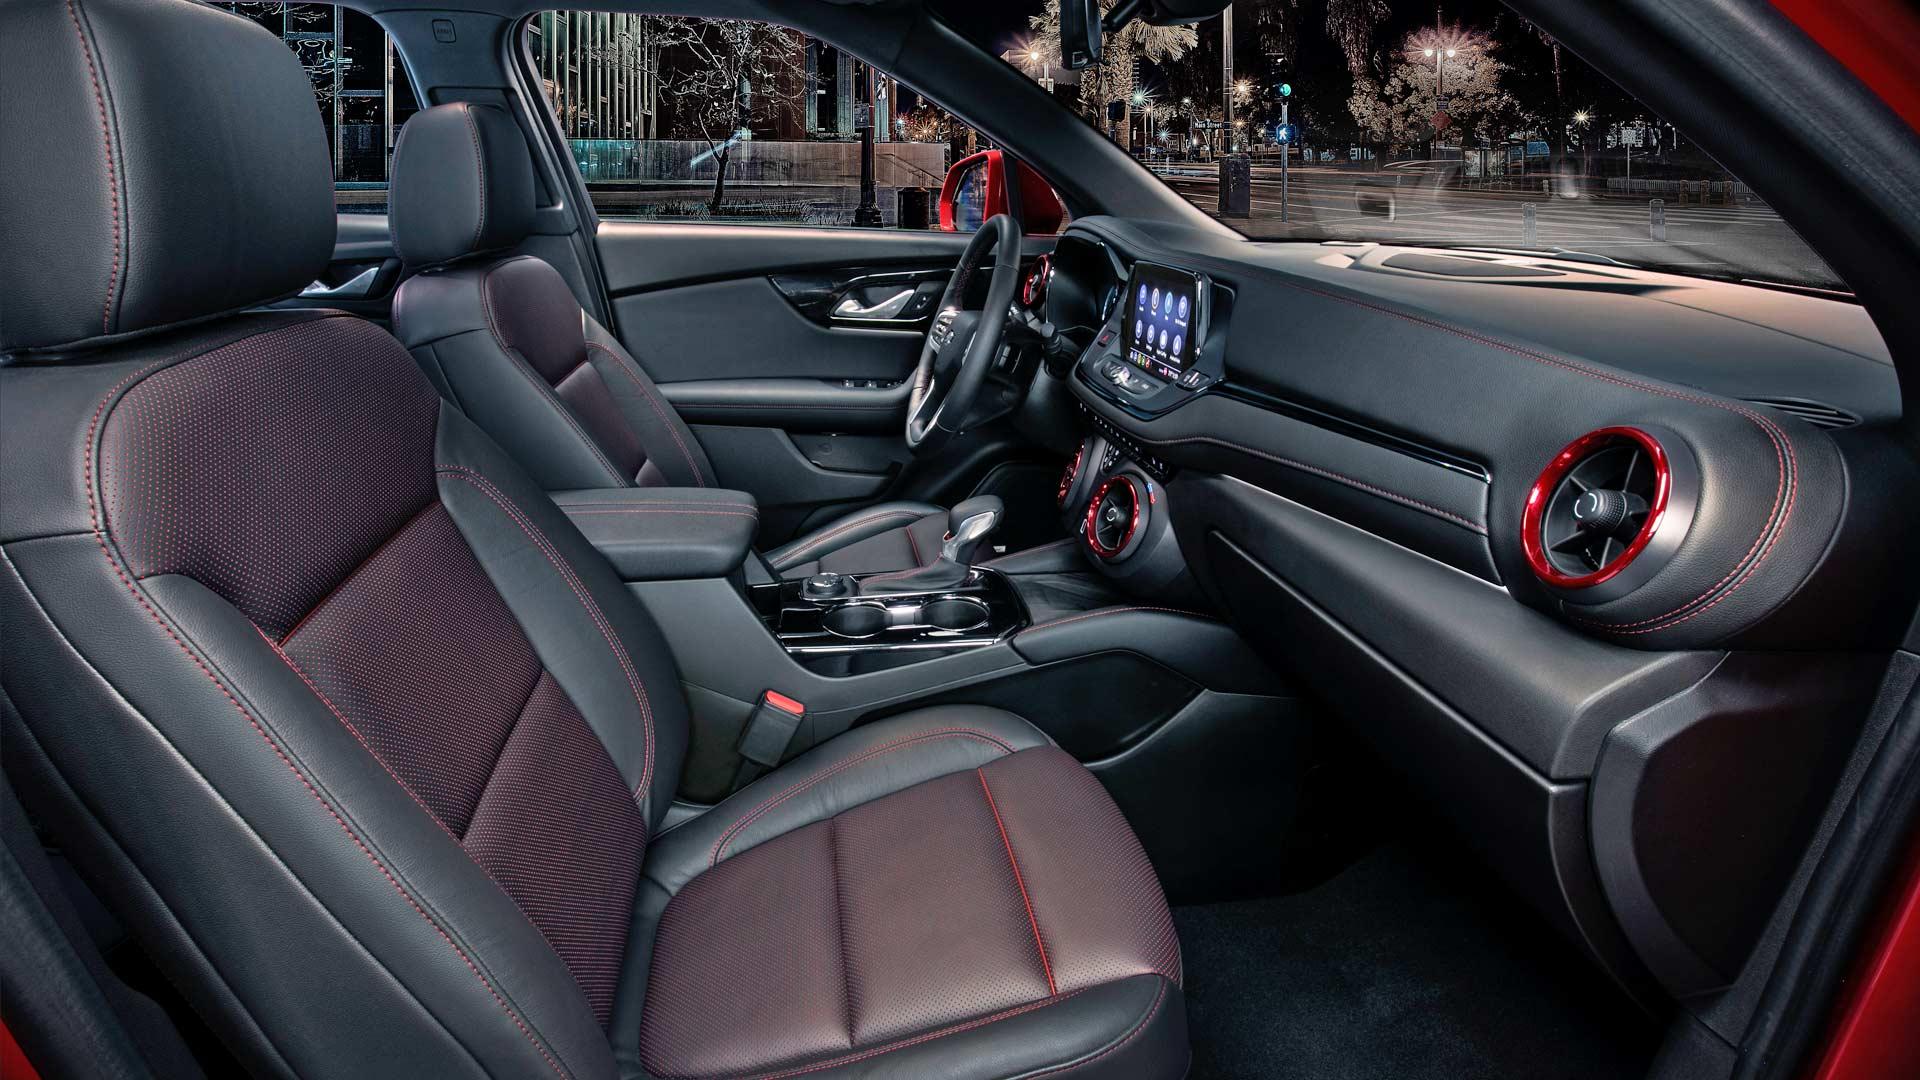 2019 Chevrolet Blazer debuts in U.S. - Autodevot